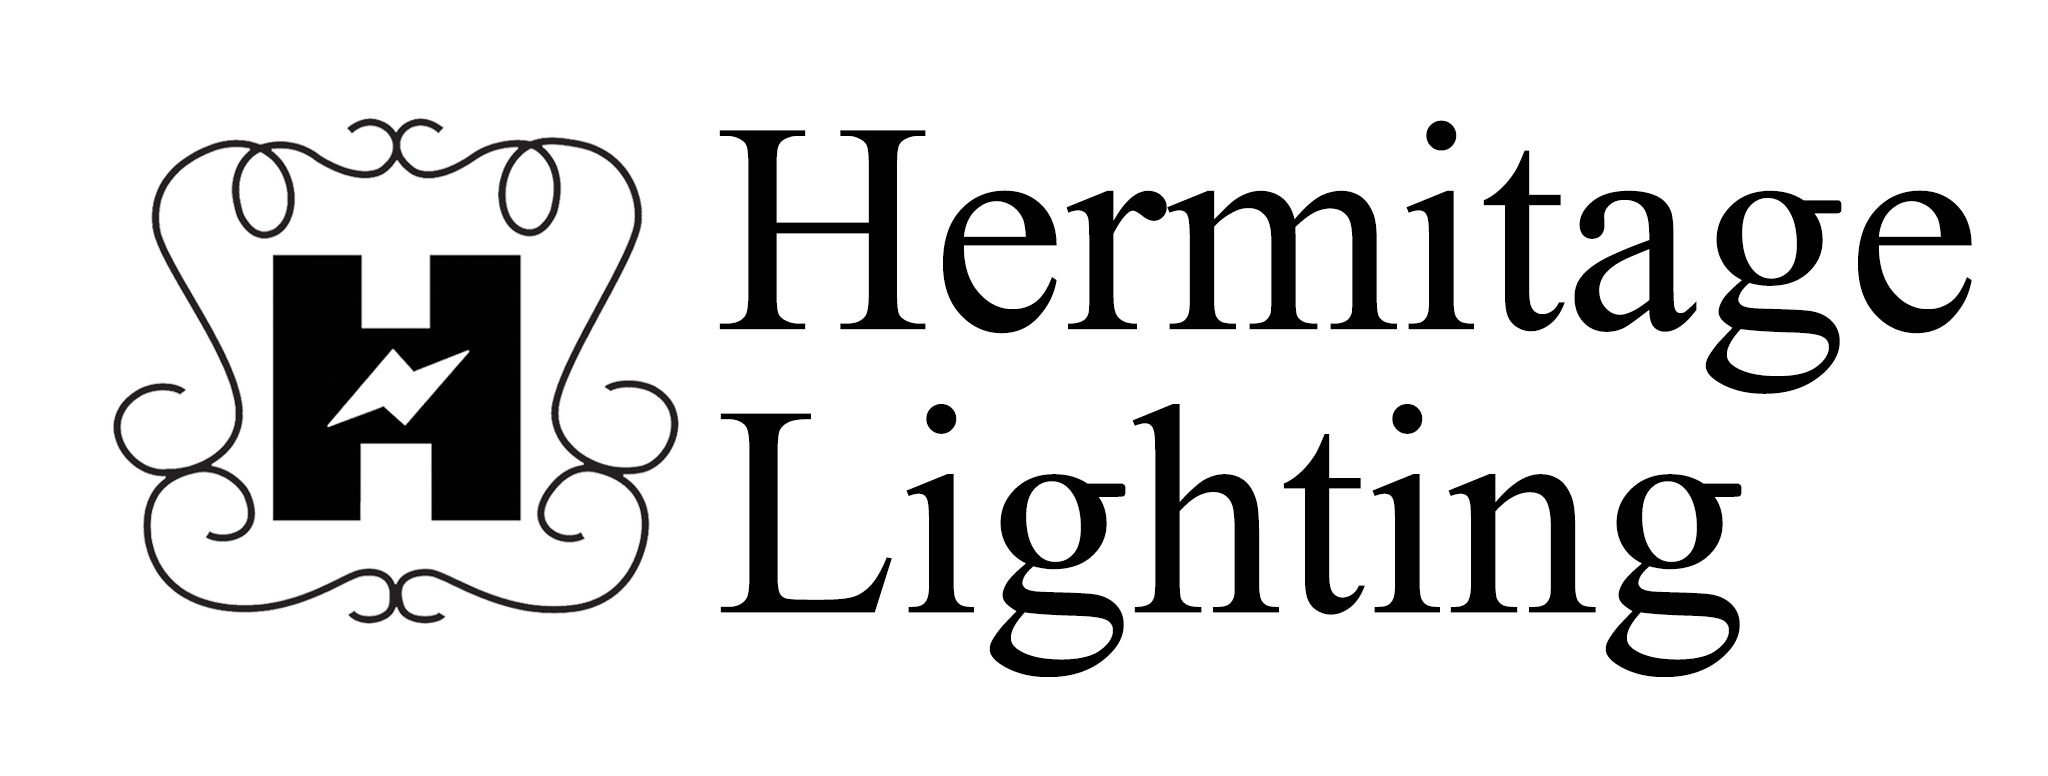 New Hermitage Lighting logo.jpg